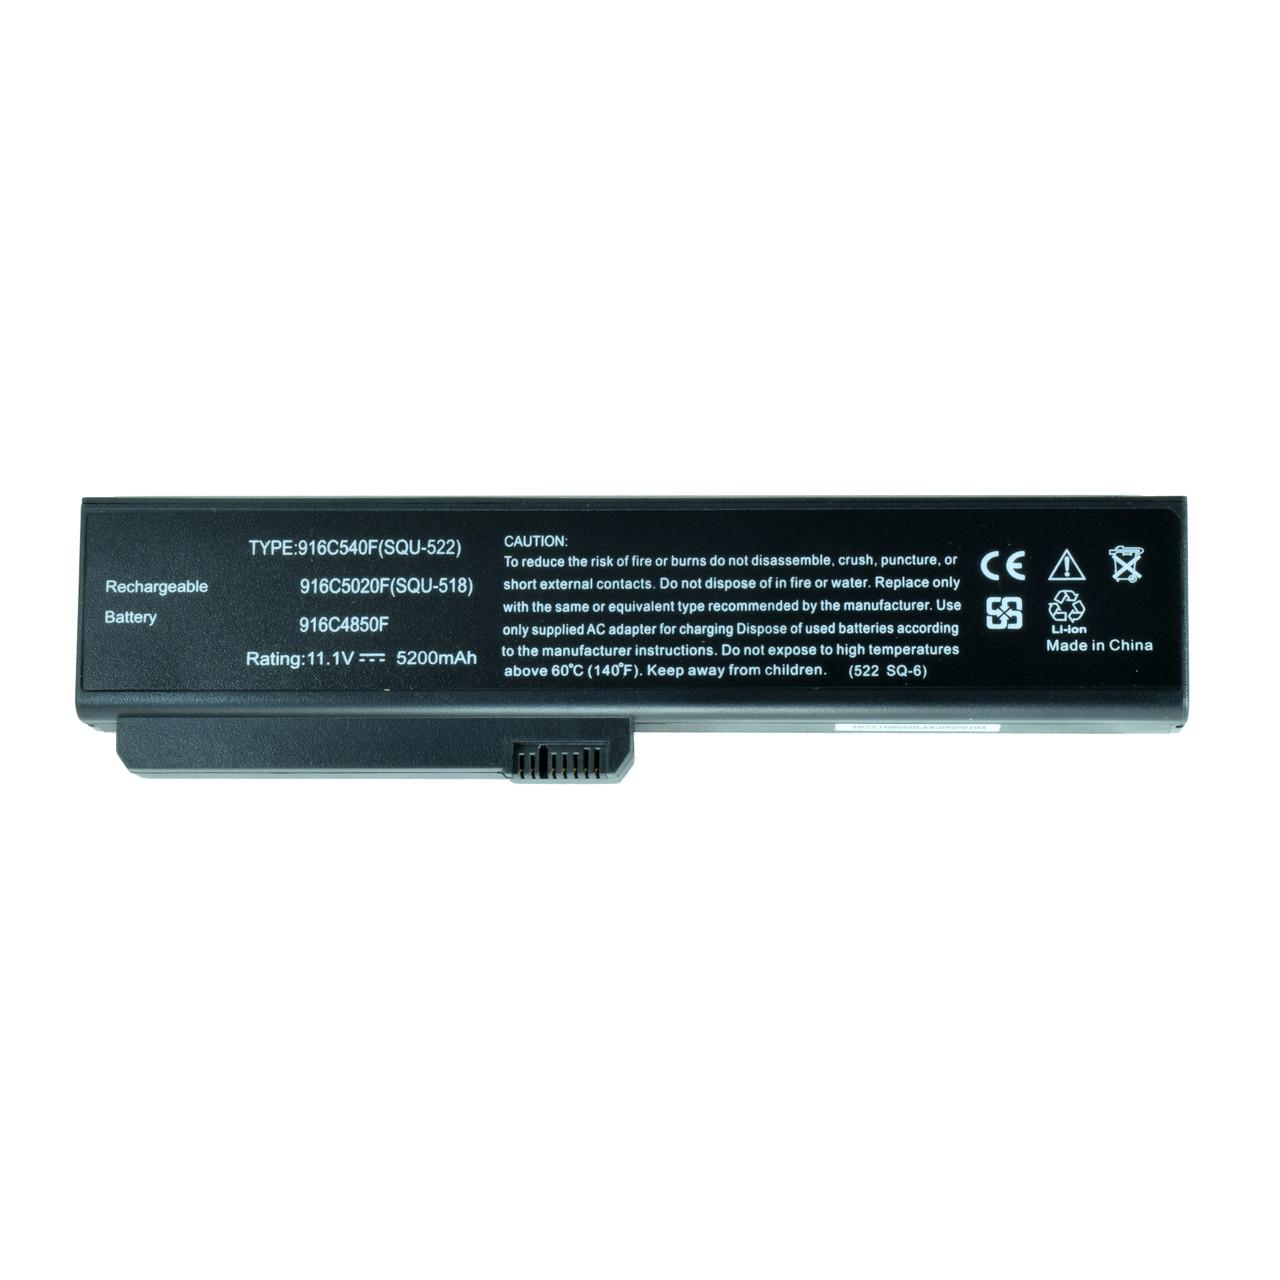 Батарея для ноутбука Fujitsu-Siemens Amilo Si1520 Amilo Pro V3205 564E1GB S280 S280N AW300